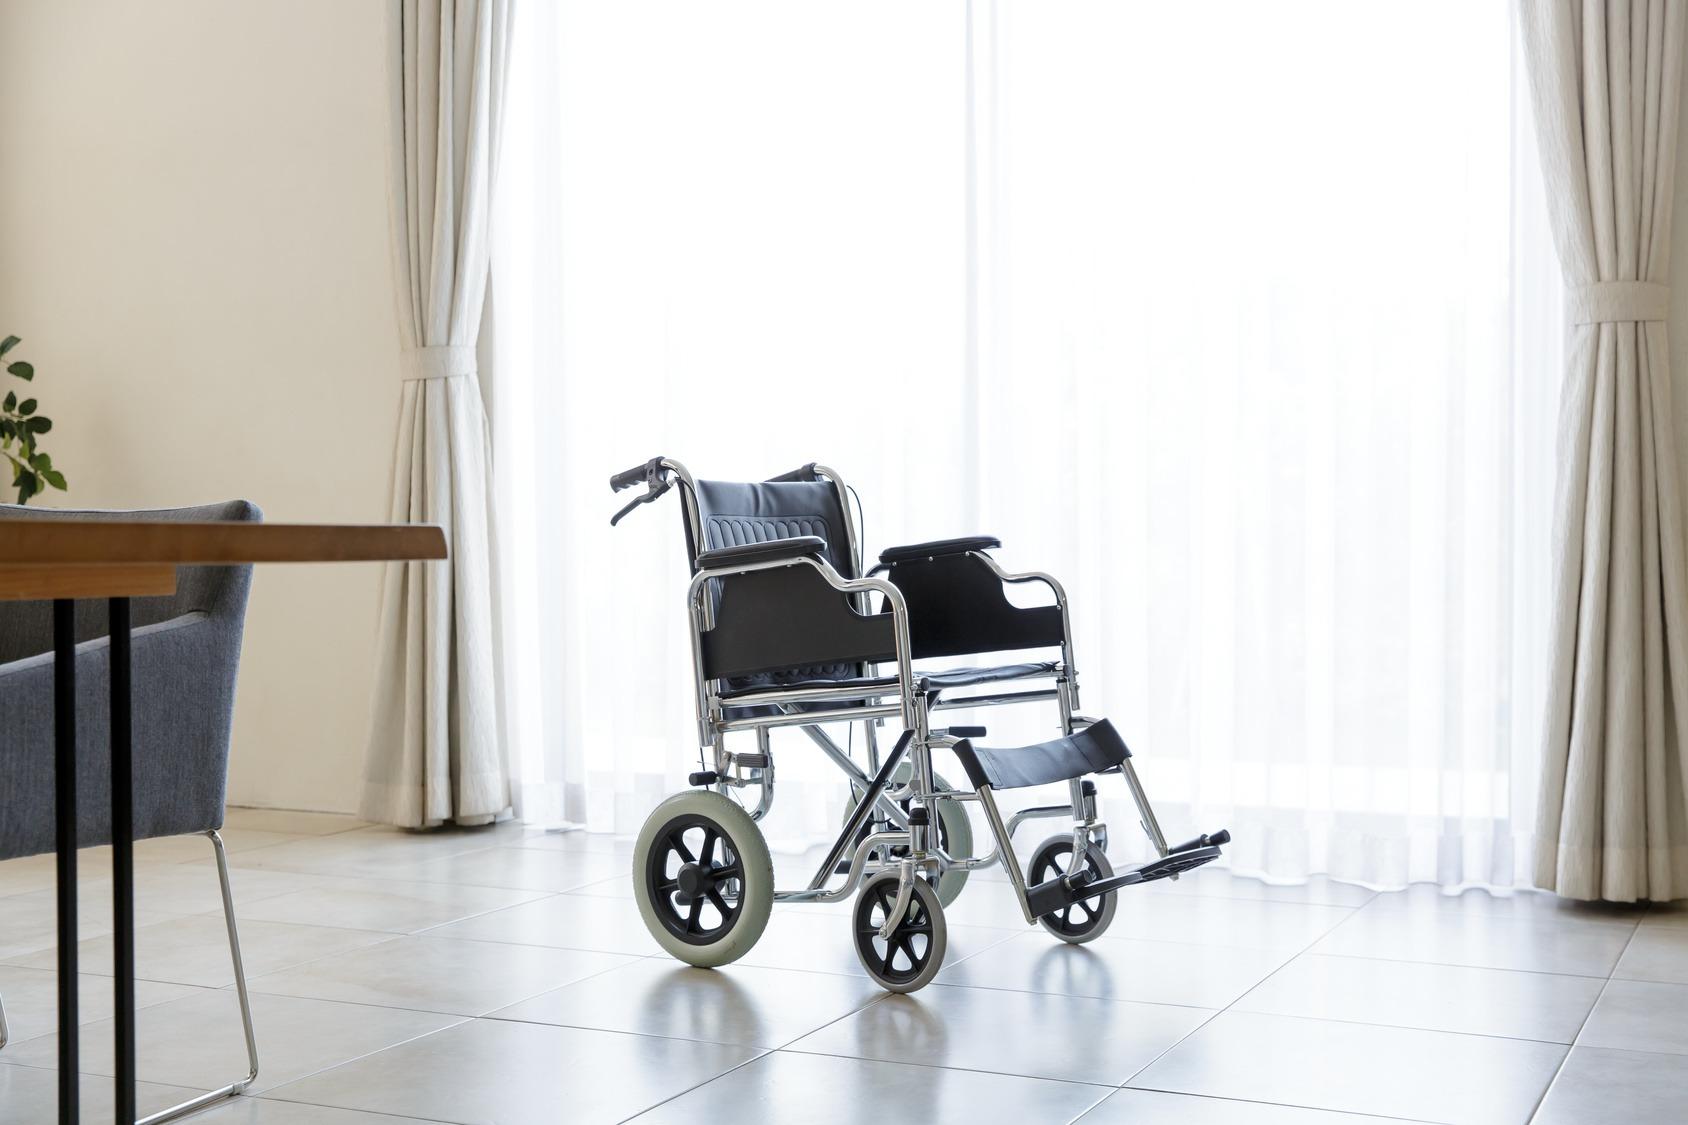 व्हील चियरको बारेमा/車椅子について